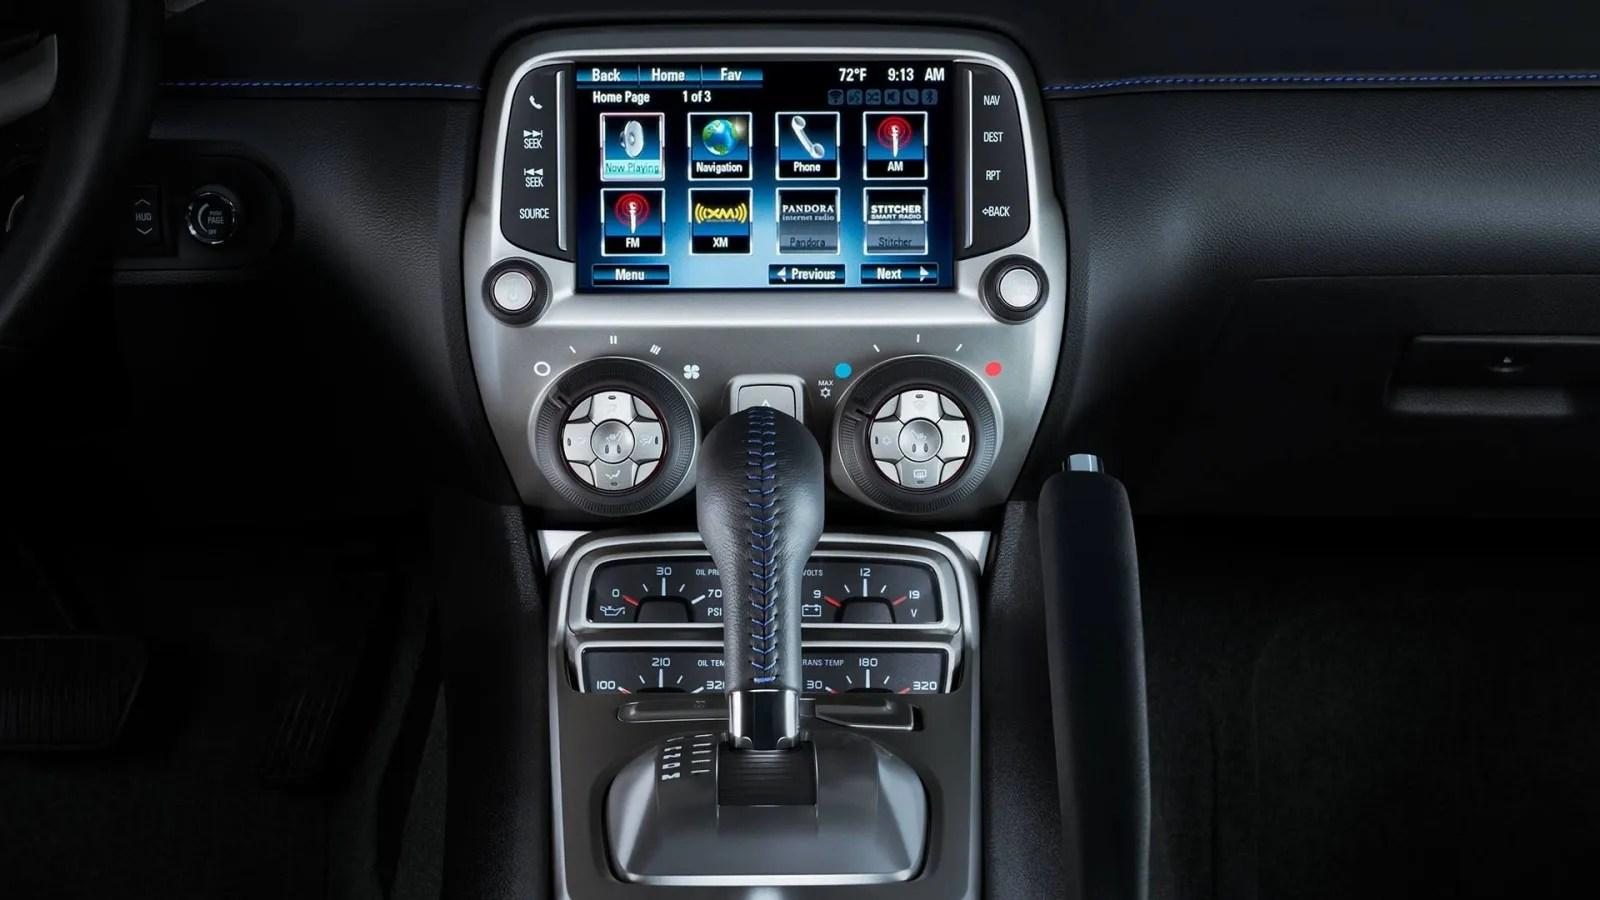 2014 2015 Chevrolet Camaro Top Speed - Gsiders.co